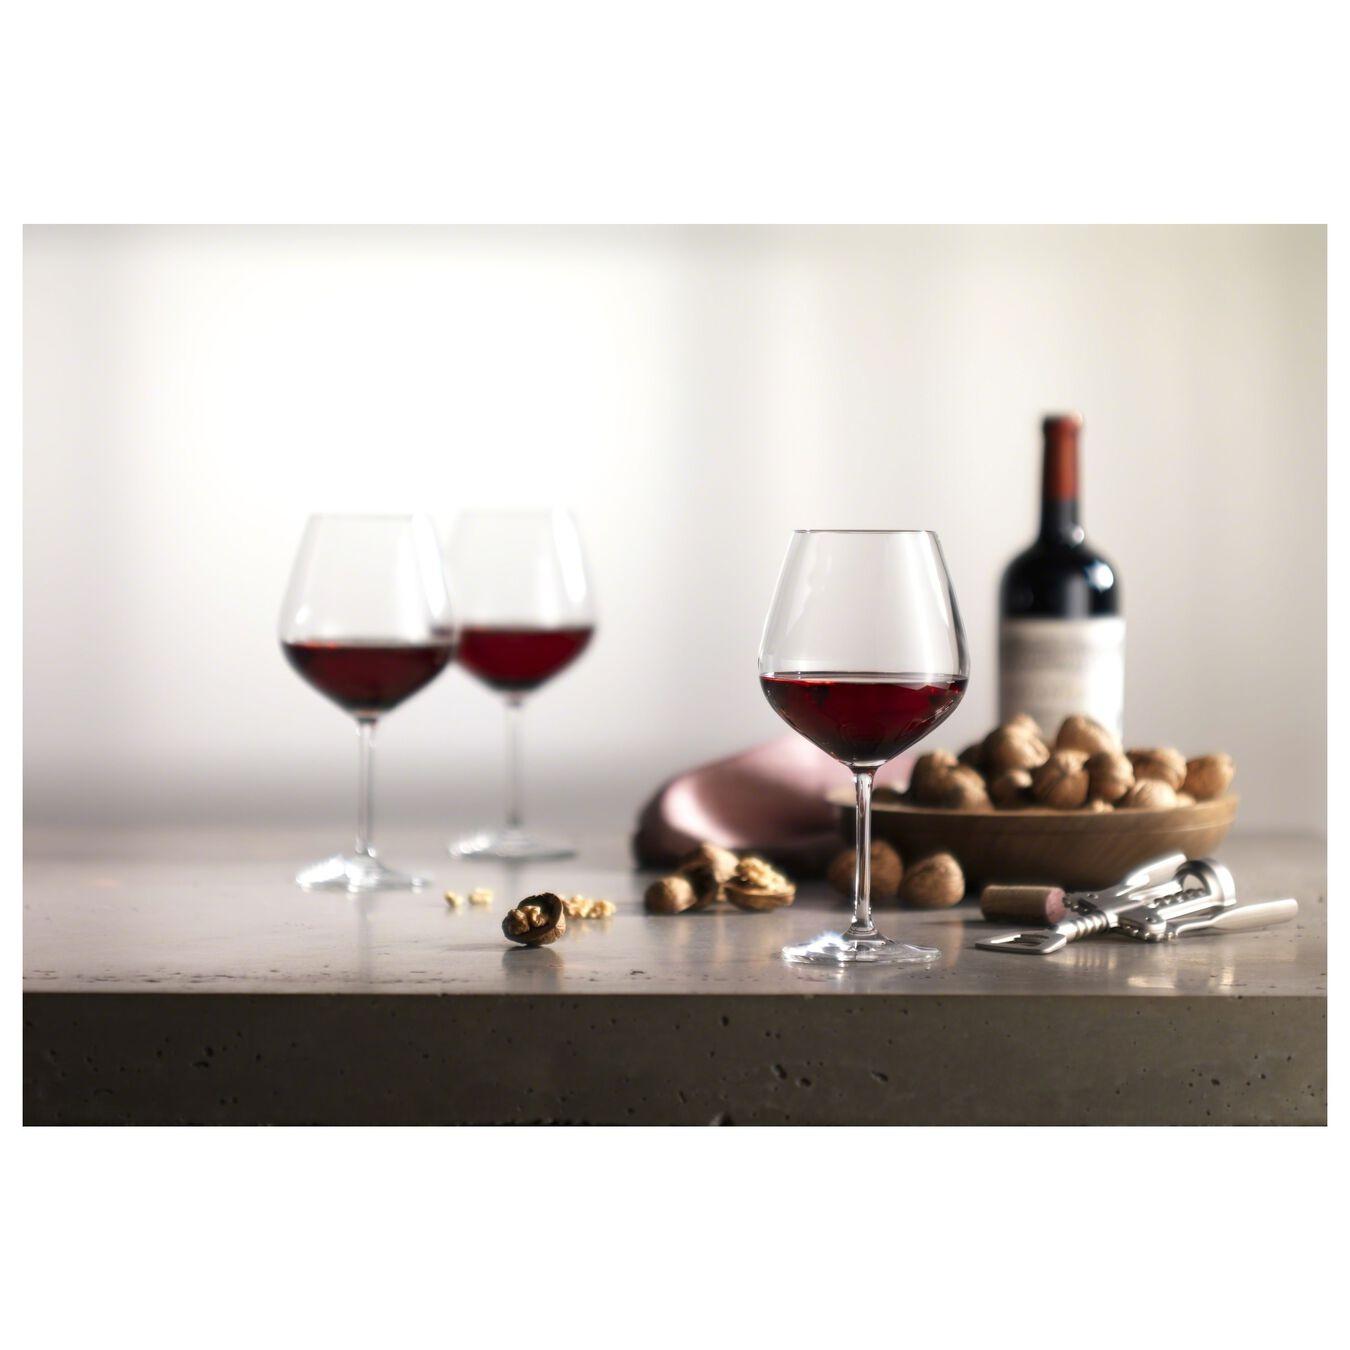 6-pc Burgundy Grand Glass Set,,large 3